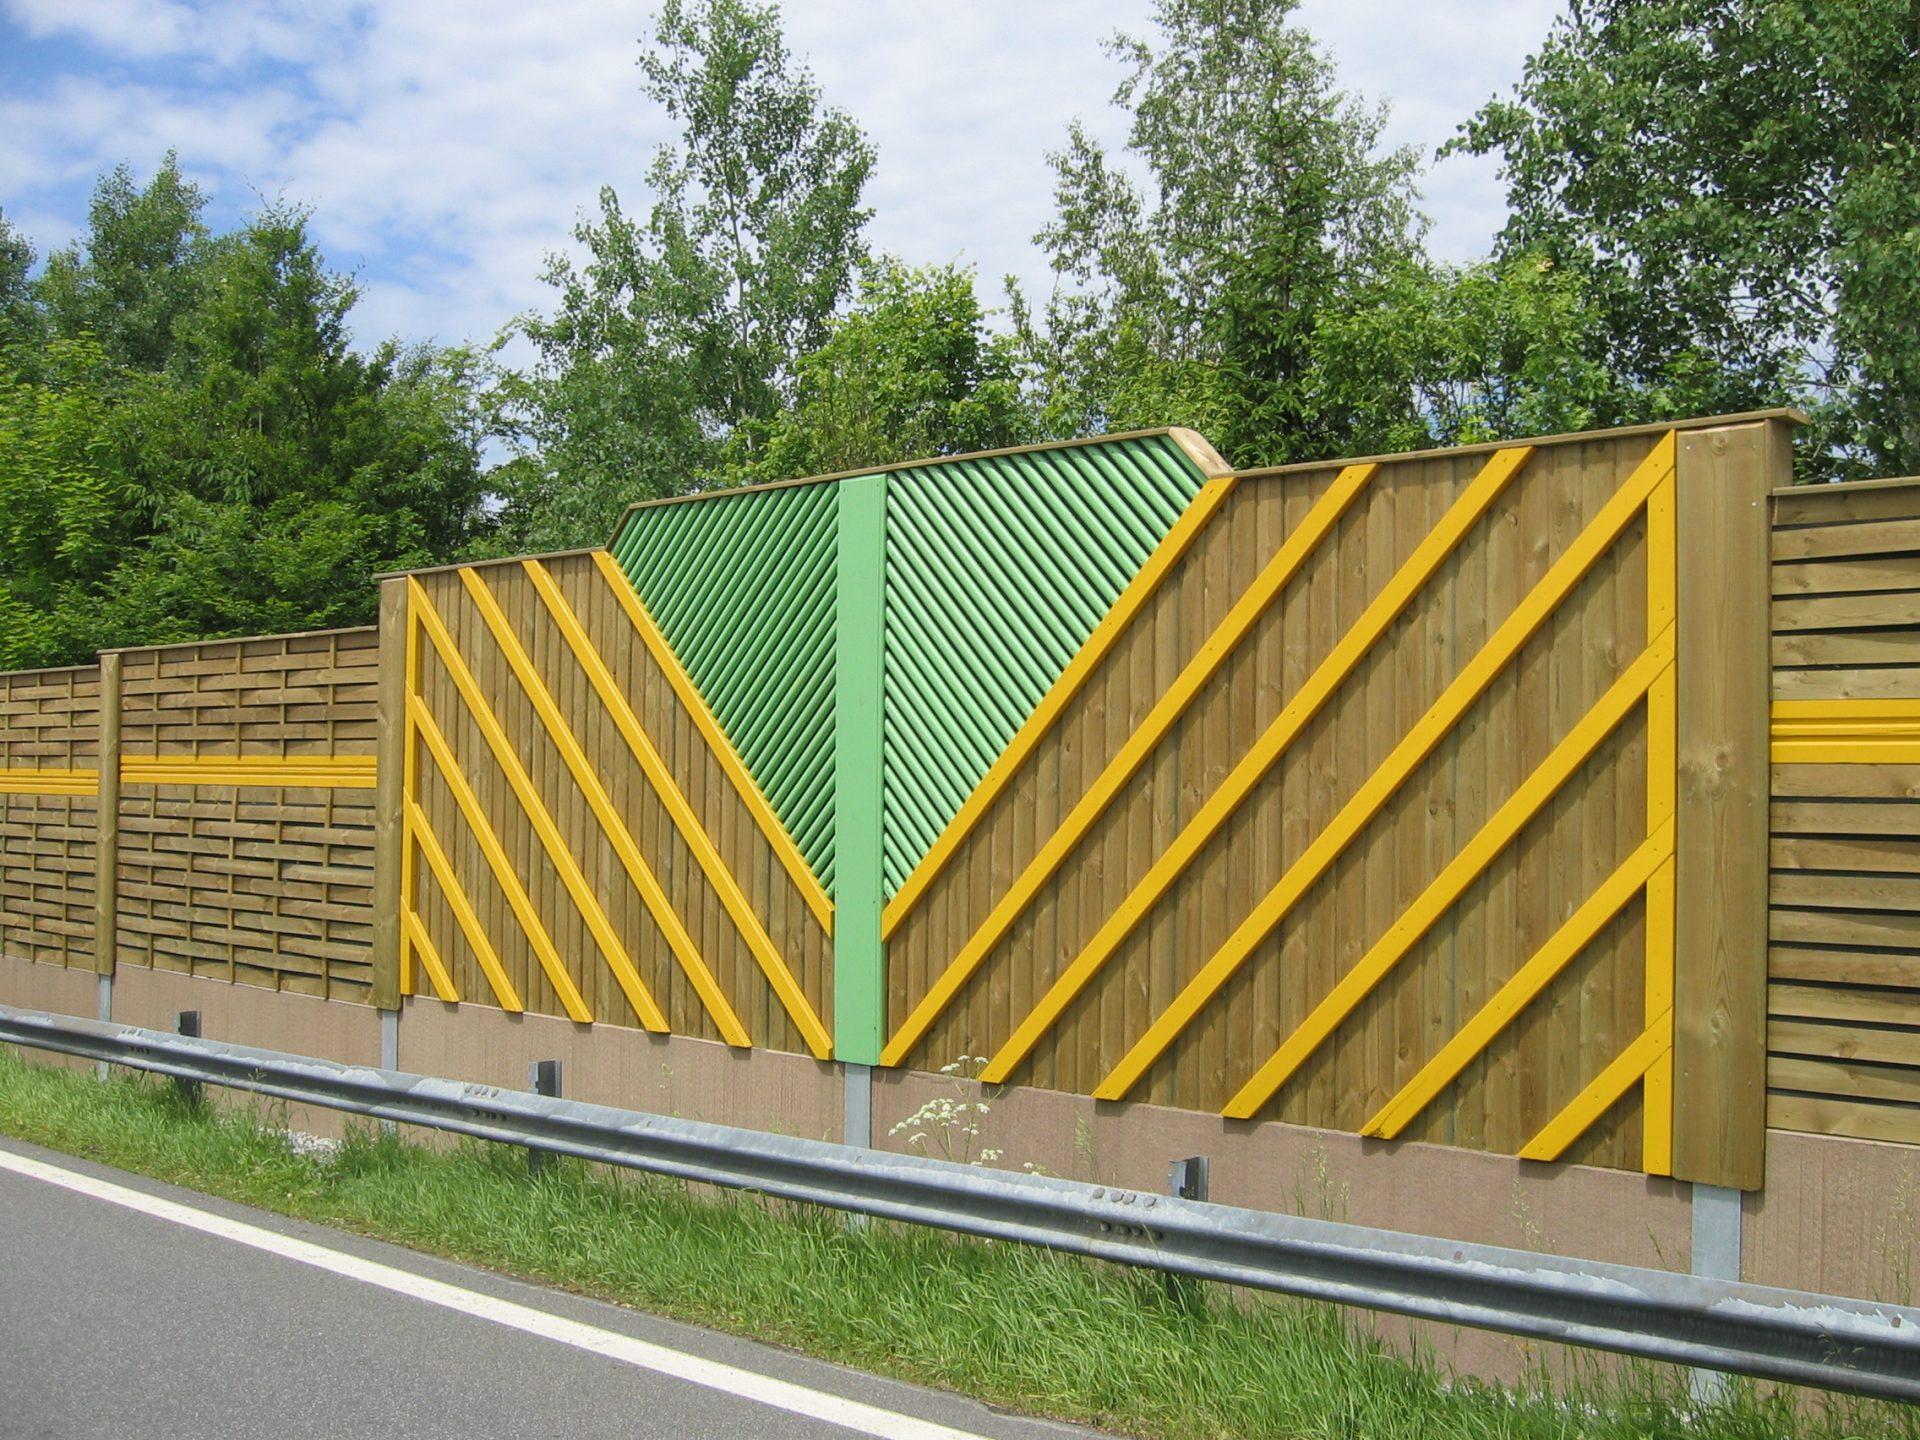 Lärmschutzwand - BST A2 St. Johann i. d. Haide (1)